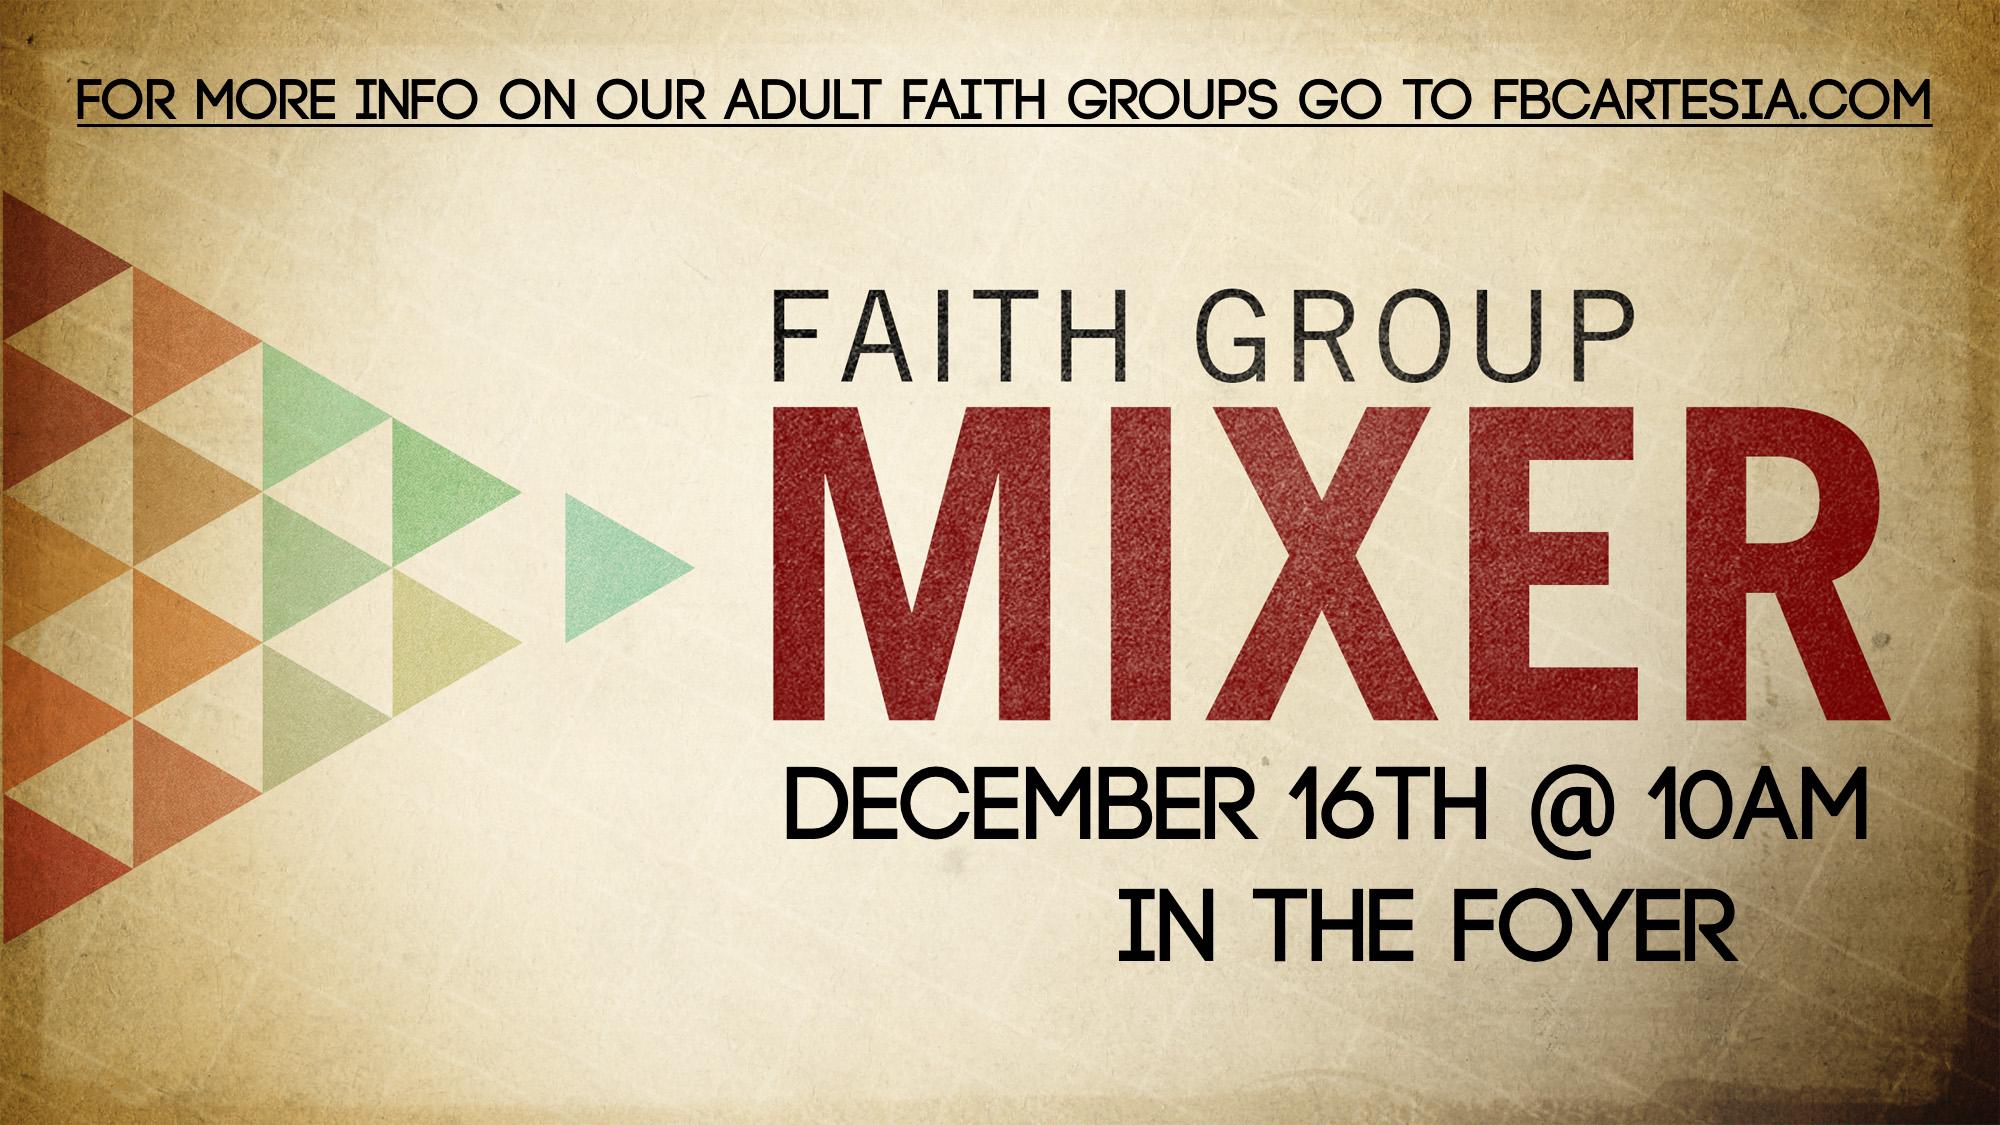 Faith_Group_Mixer_WIDE-TITLE-2 copy.jpg